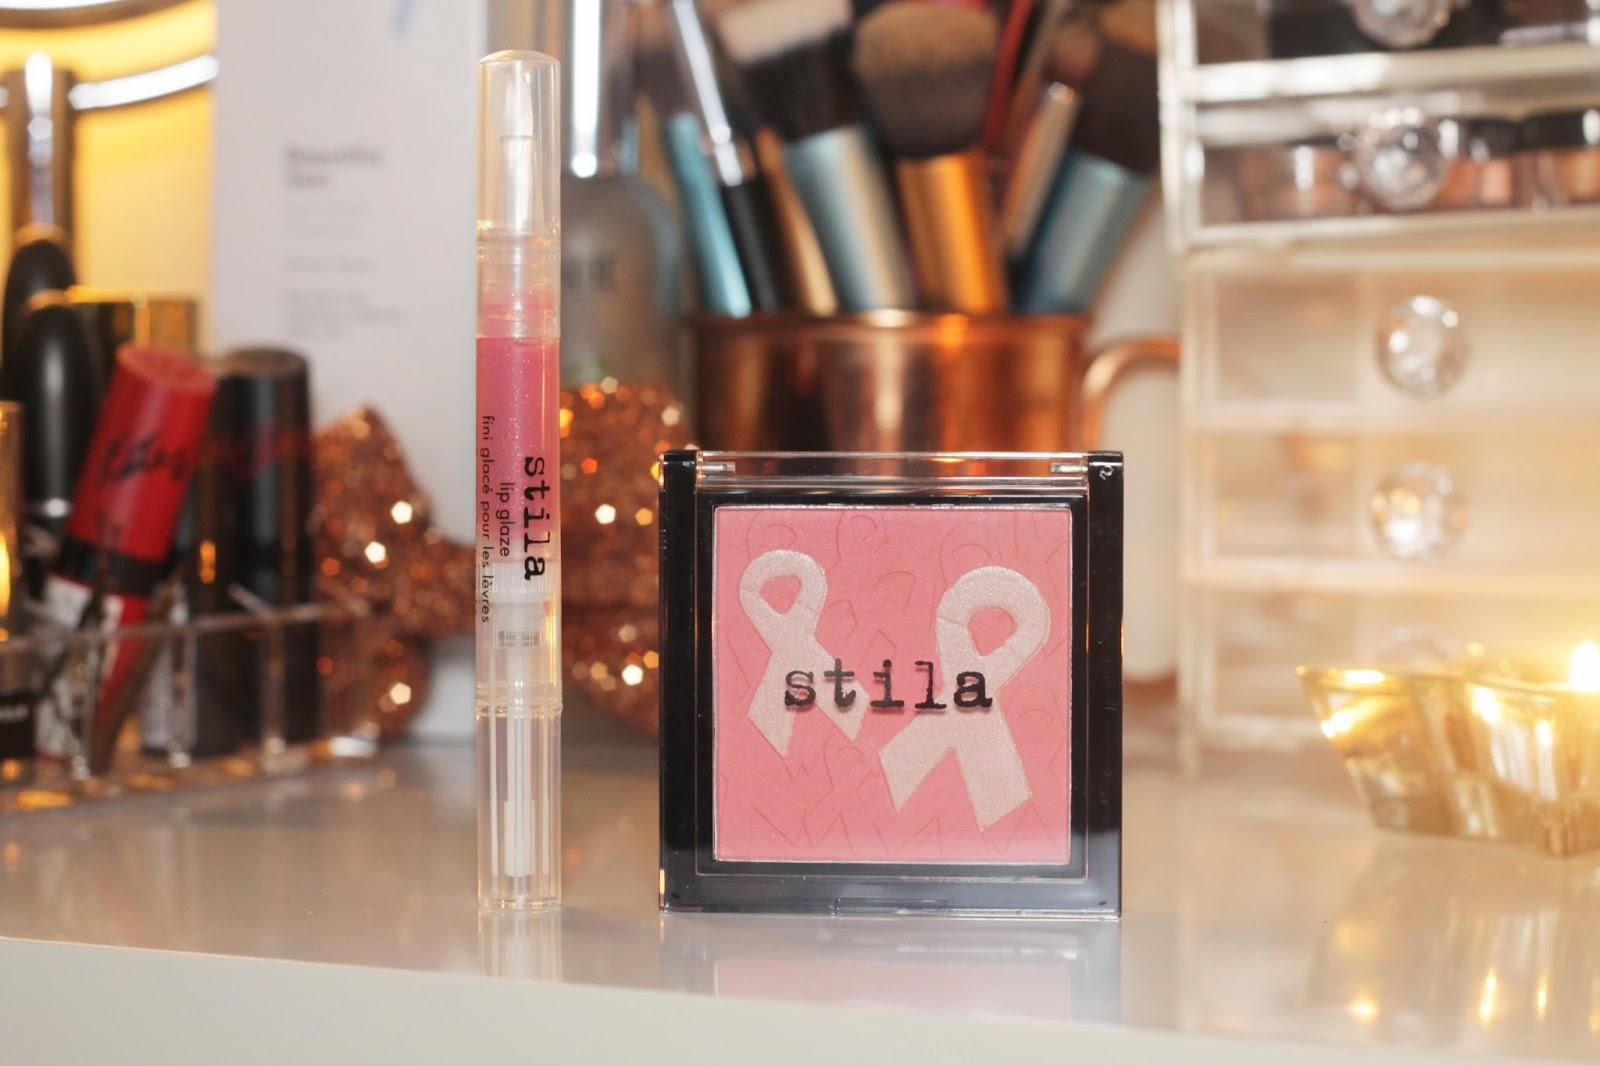 stila-makeup-swatch-review